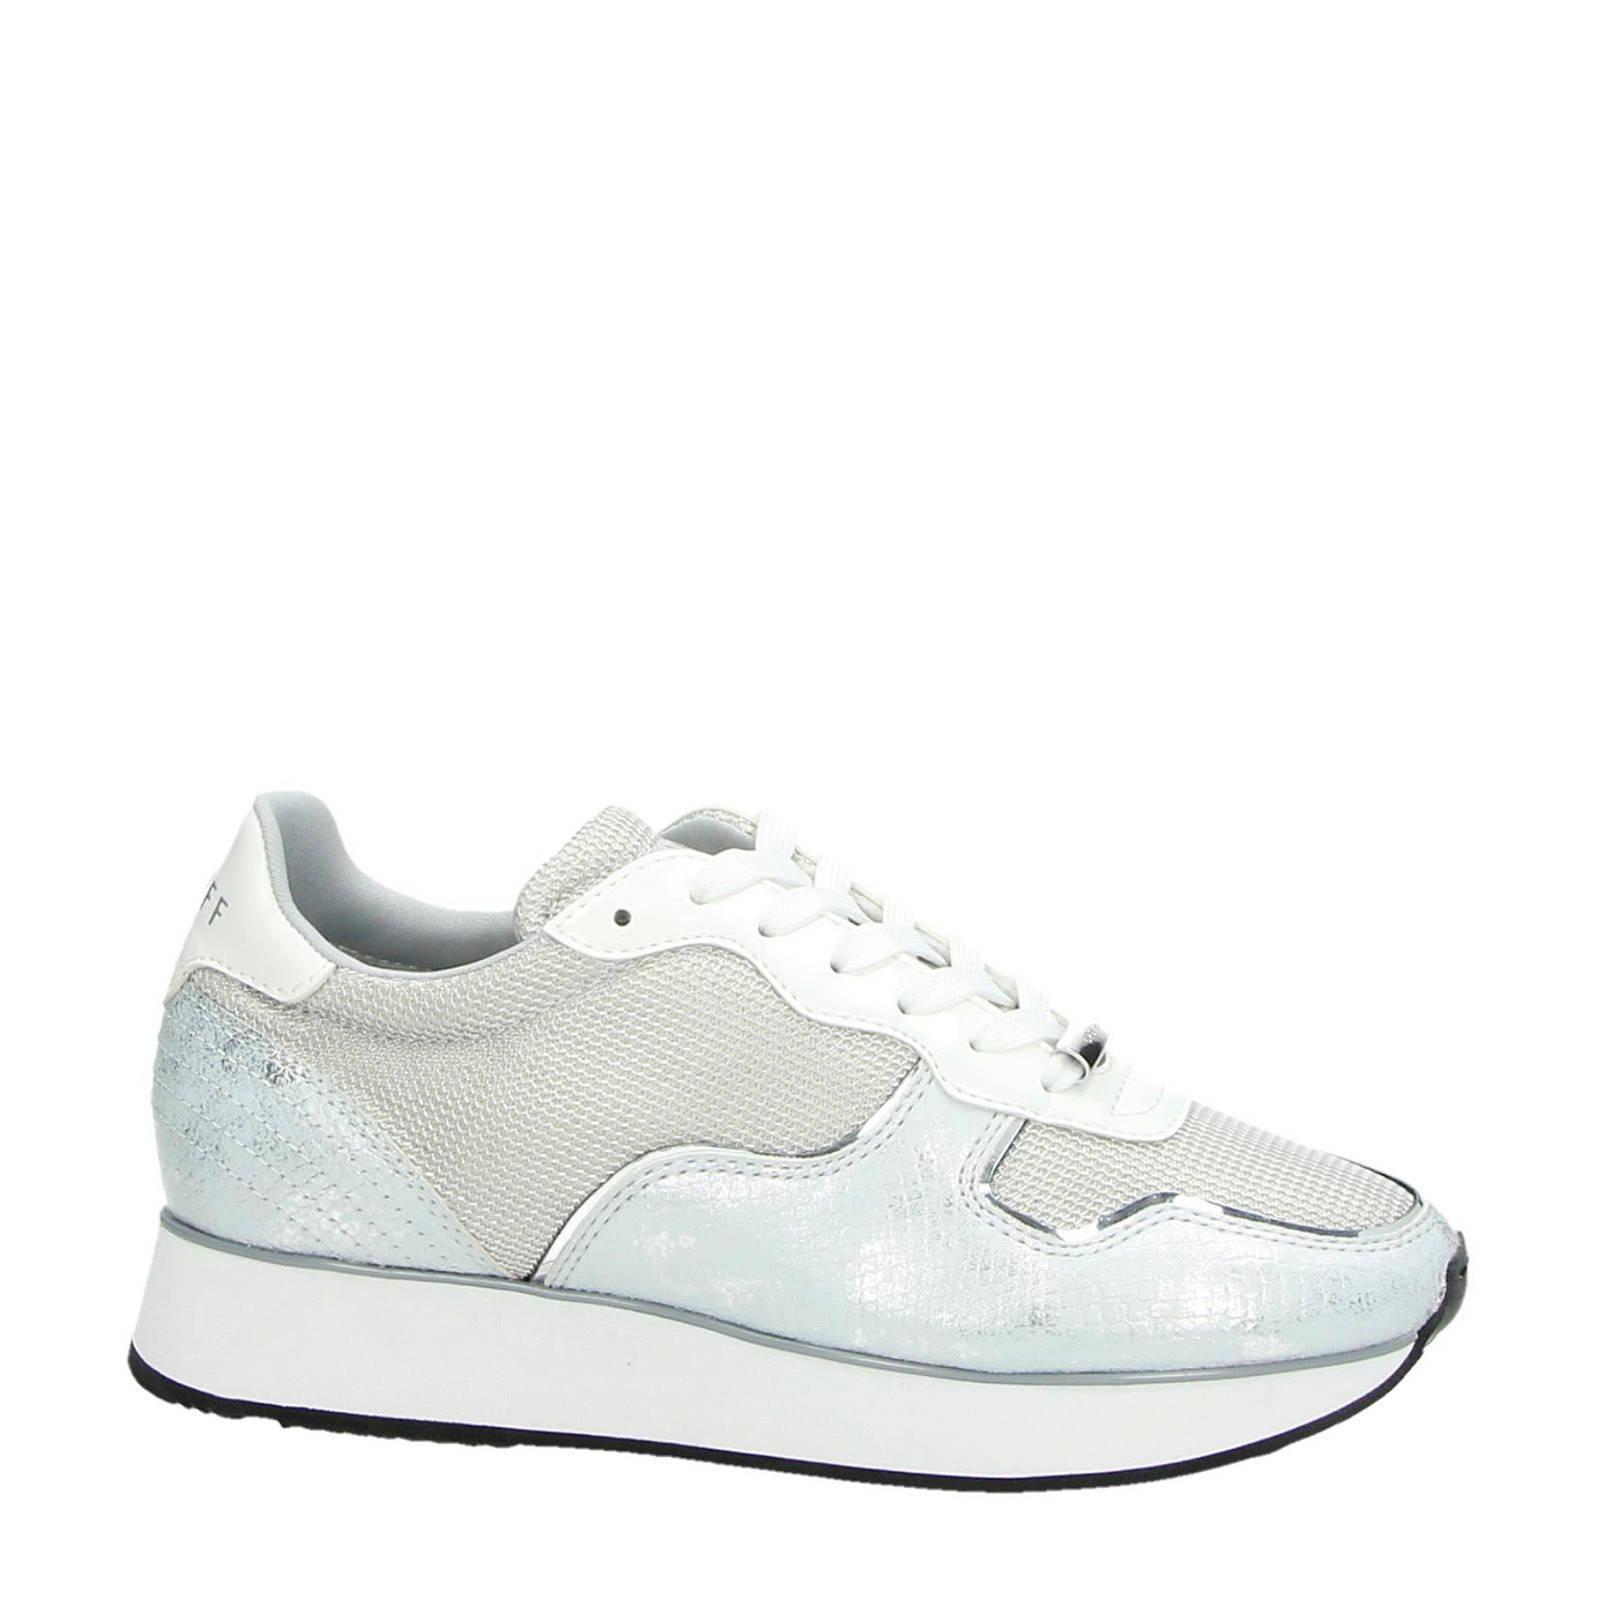 Perfetto Sneakers Sneakers Cruyff Cruyff Perfetto Cruyff Perfetto Wit Wit zUVqGSMp